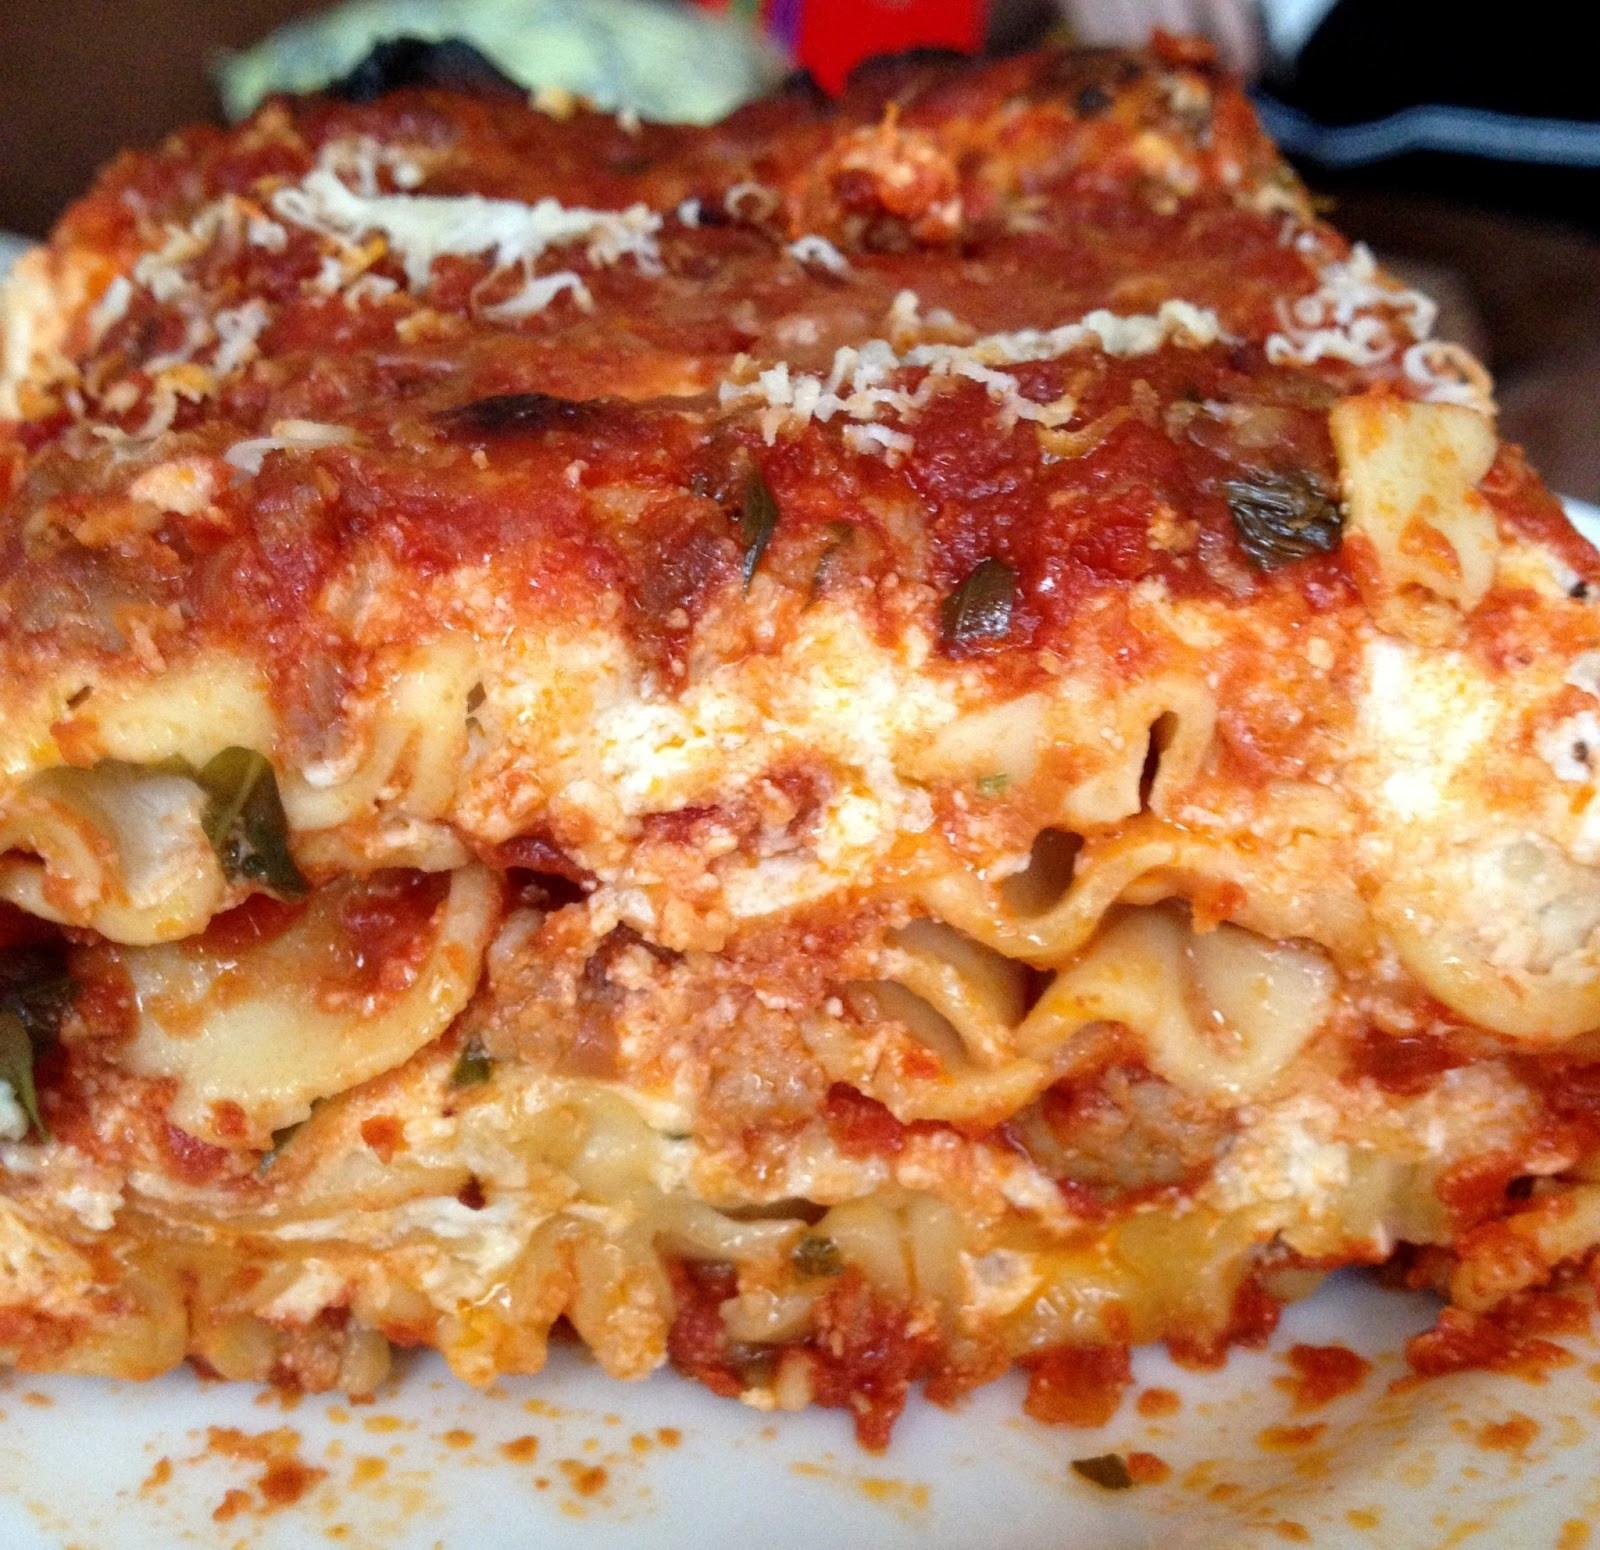 Ina Garten Turkey Lasagna  girl next door baked goods Dinner tonight Ina Garten s